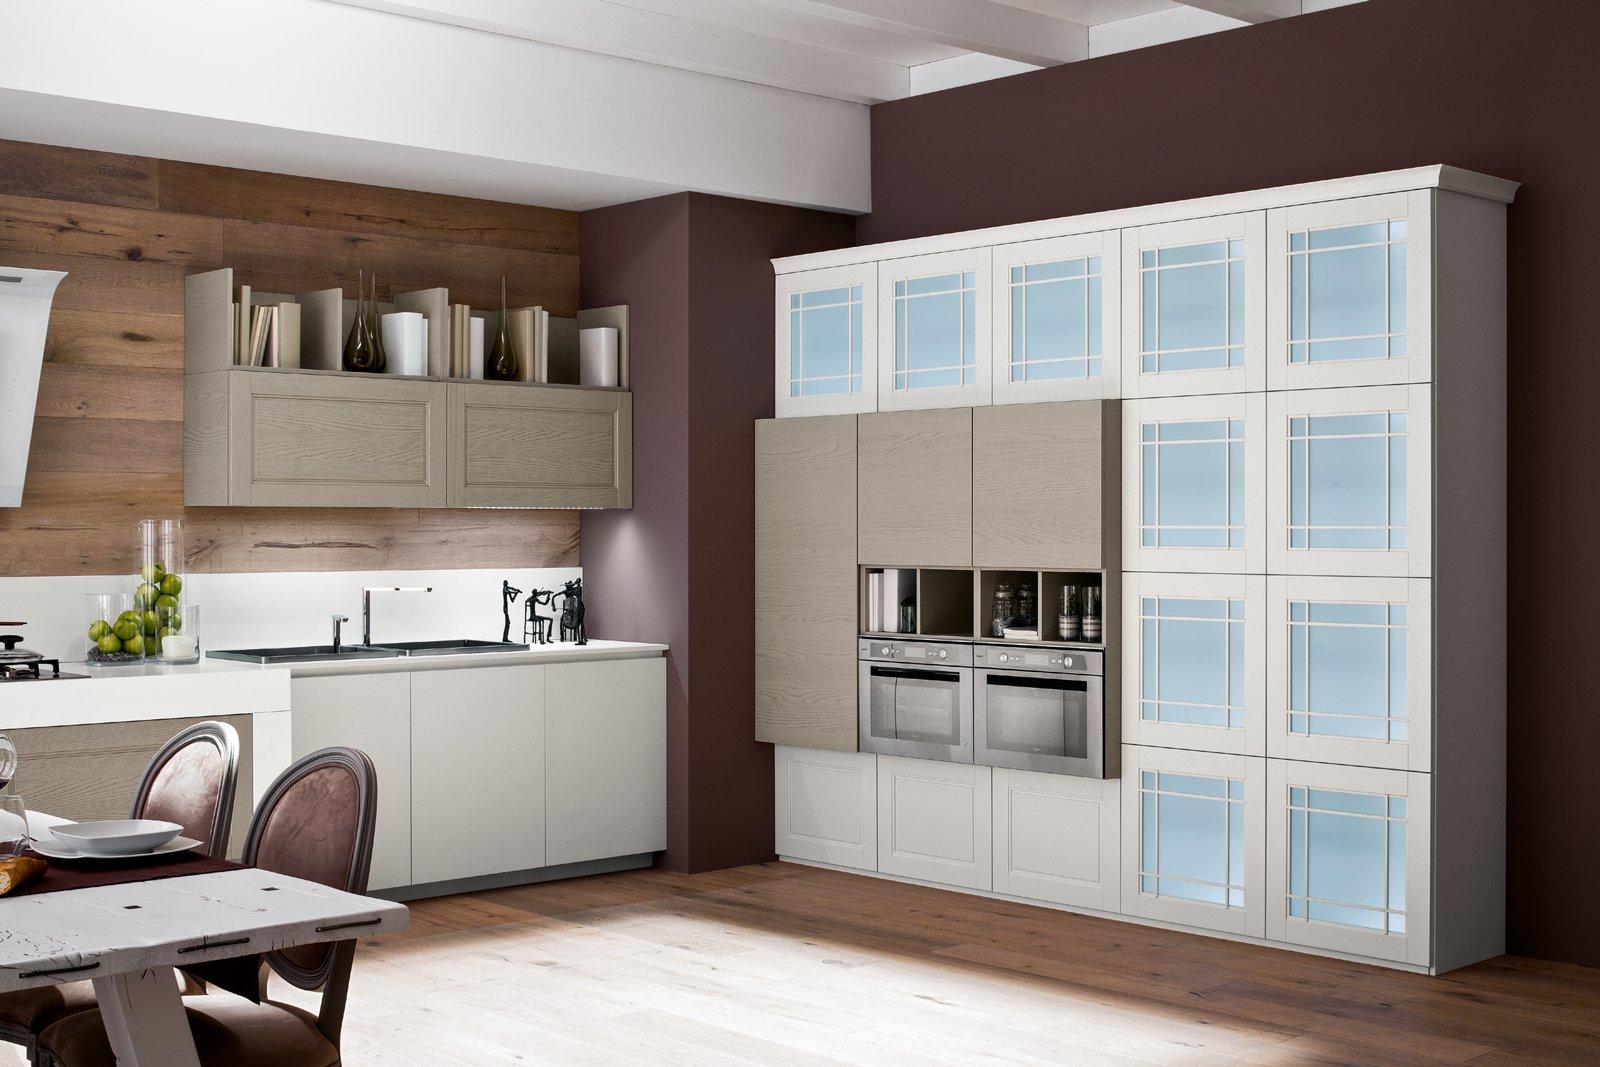 Cucina con vetrina soprattutto classica o in stile industriale cose di casa - Cucine arrex prezzi ...